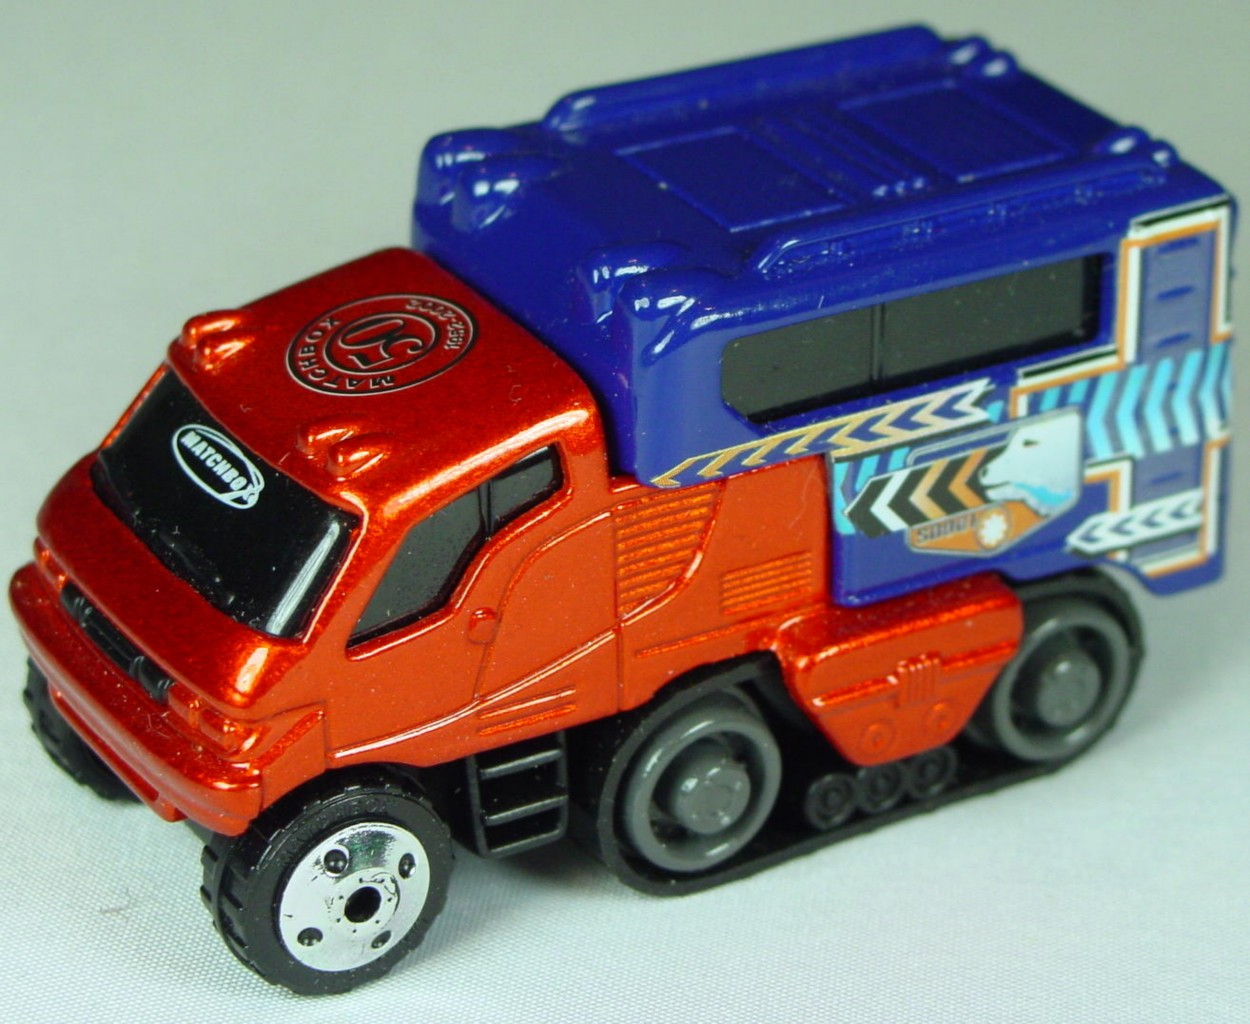 Pre-production 06 I 5 - Arctic Track truck met Brnz MBX 50 rivet glue made in China